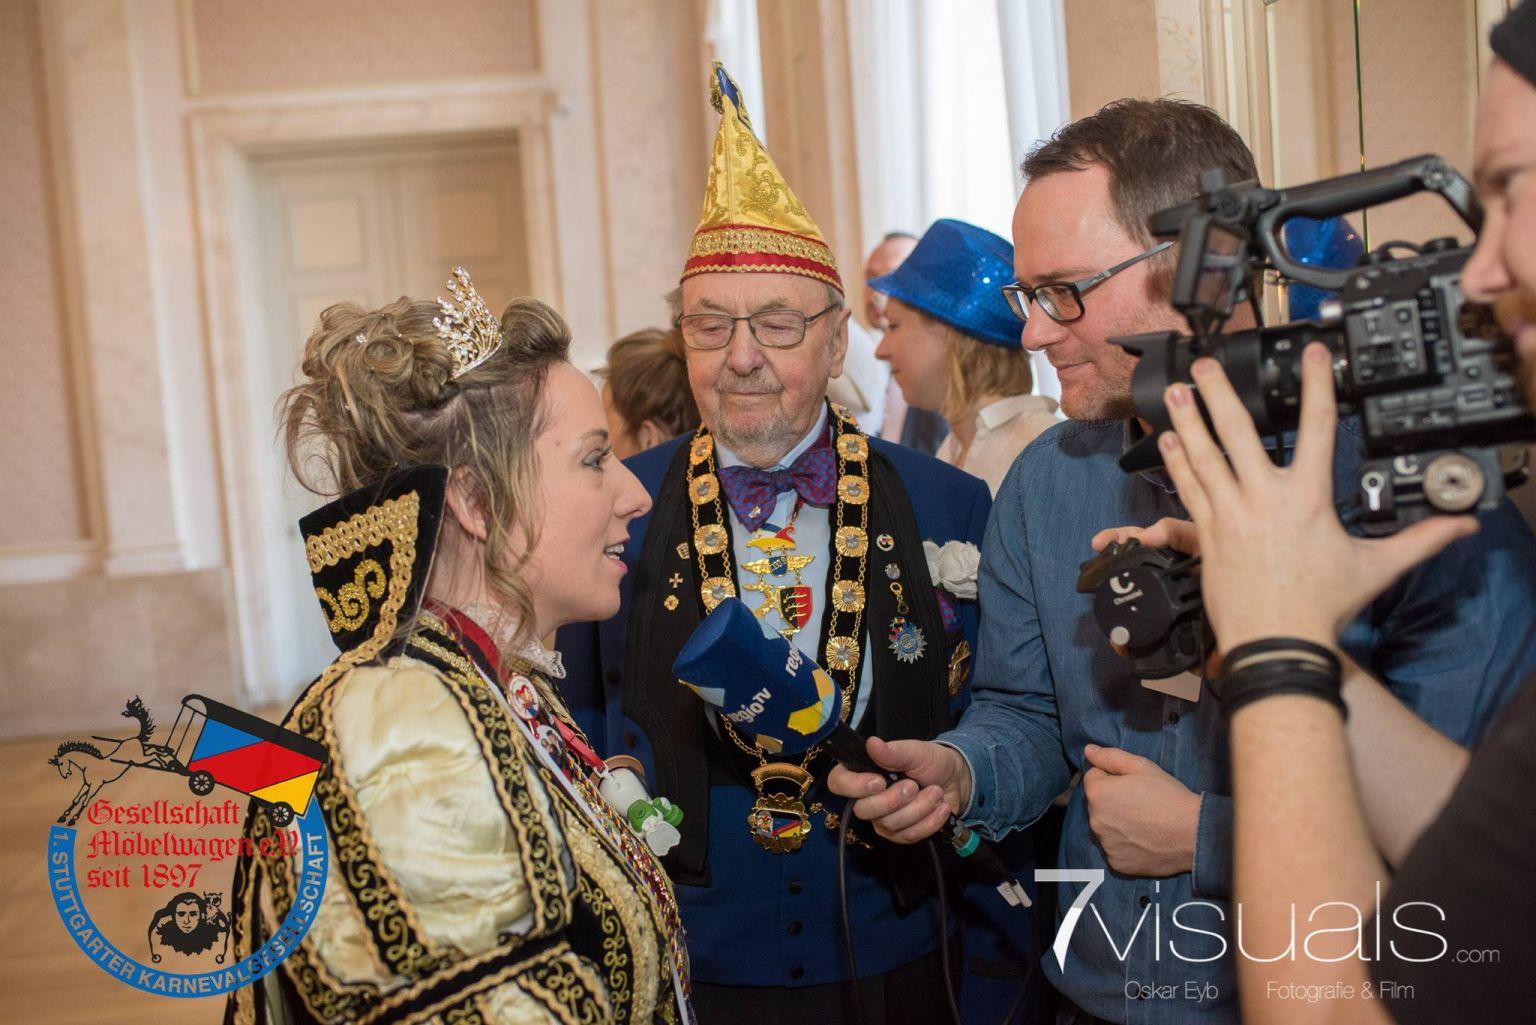 mw-empfang-minister-strobl-2018-015.jpg